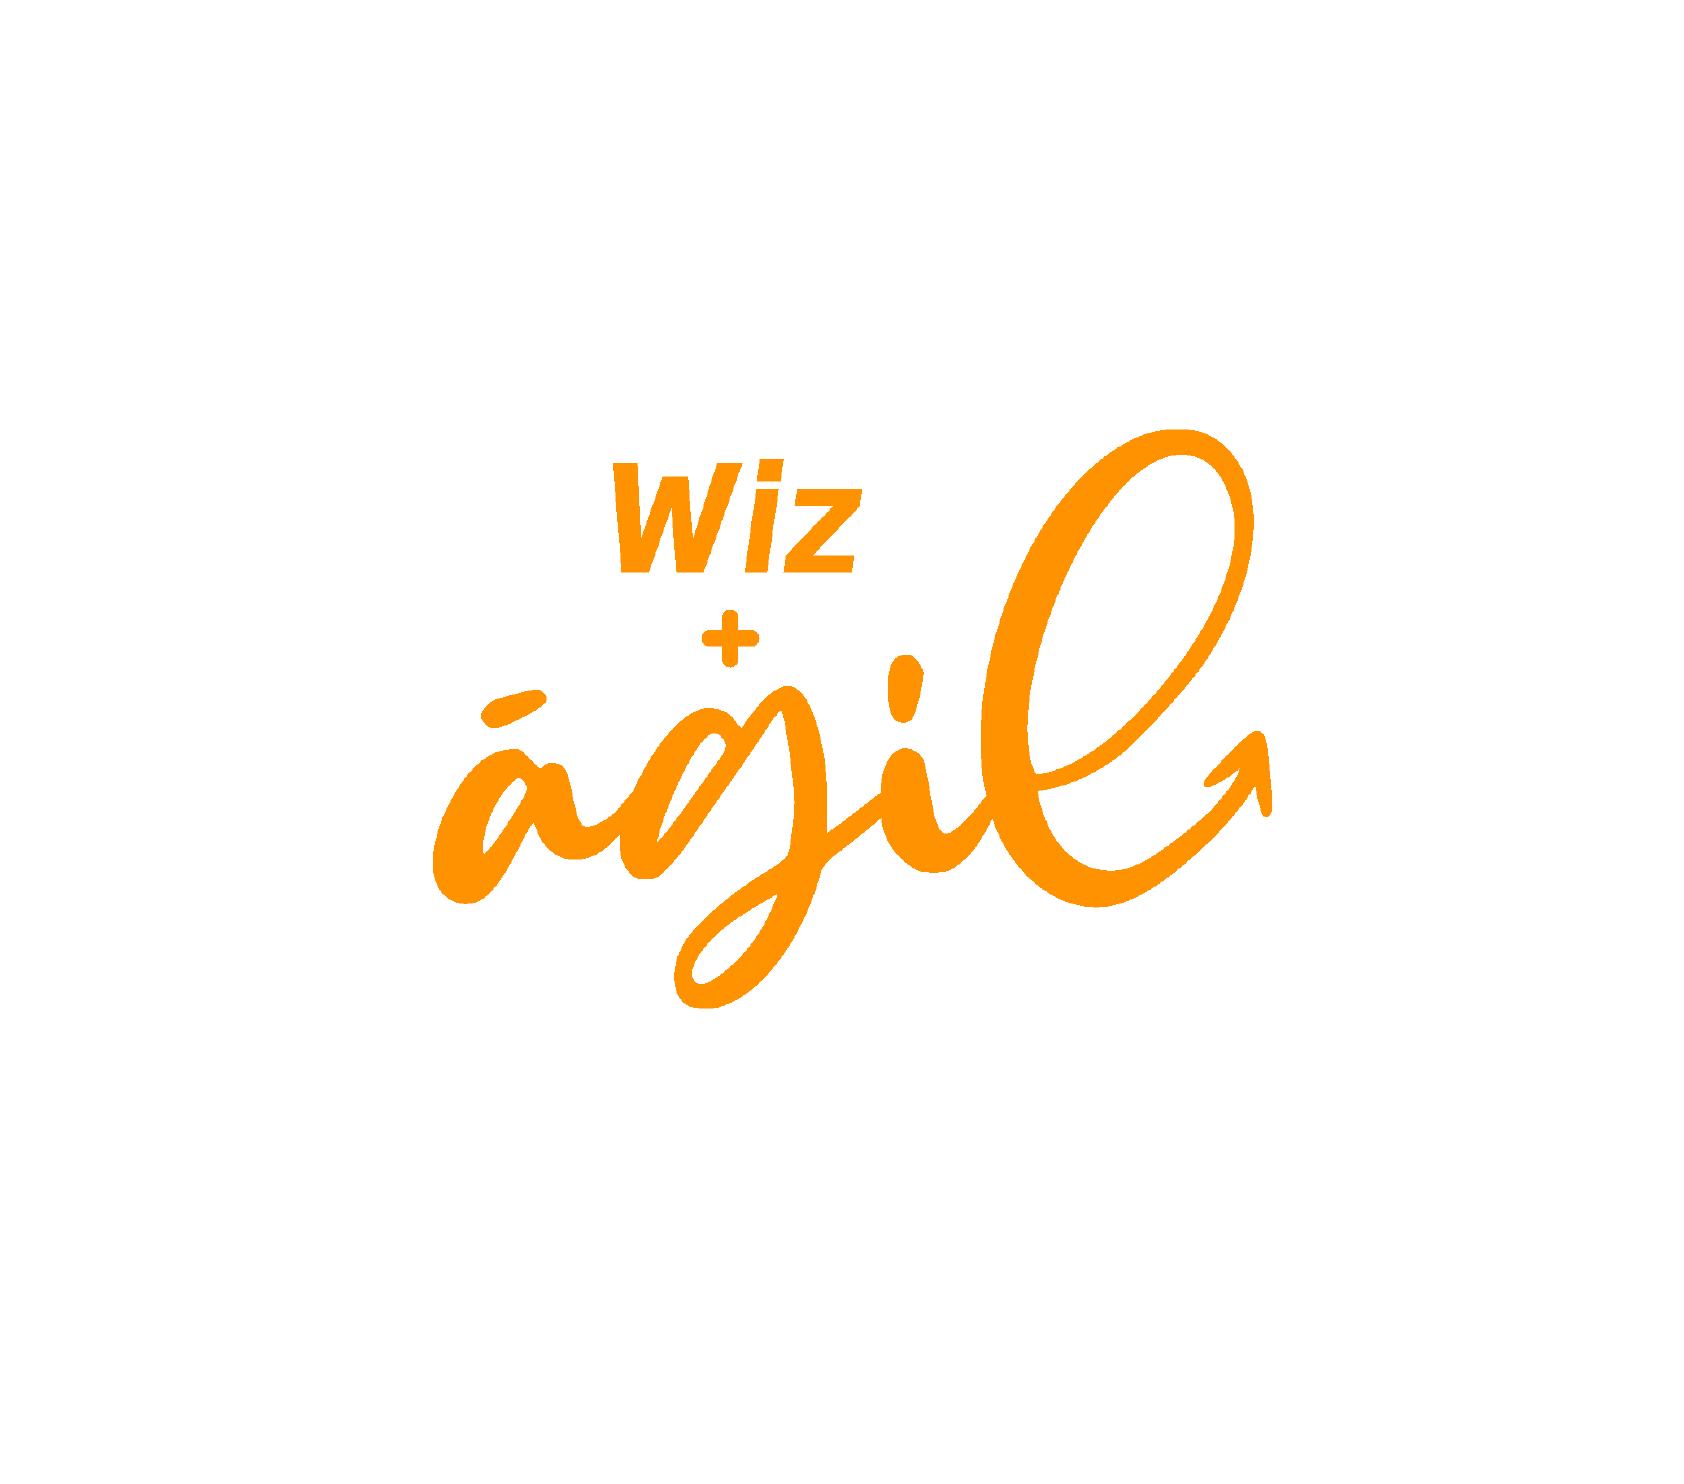 https://jobs.kenoby.com/wizagil